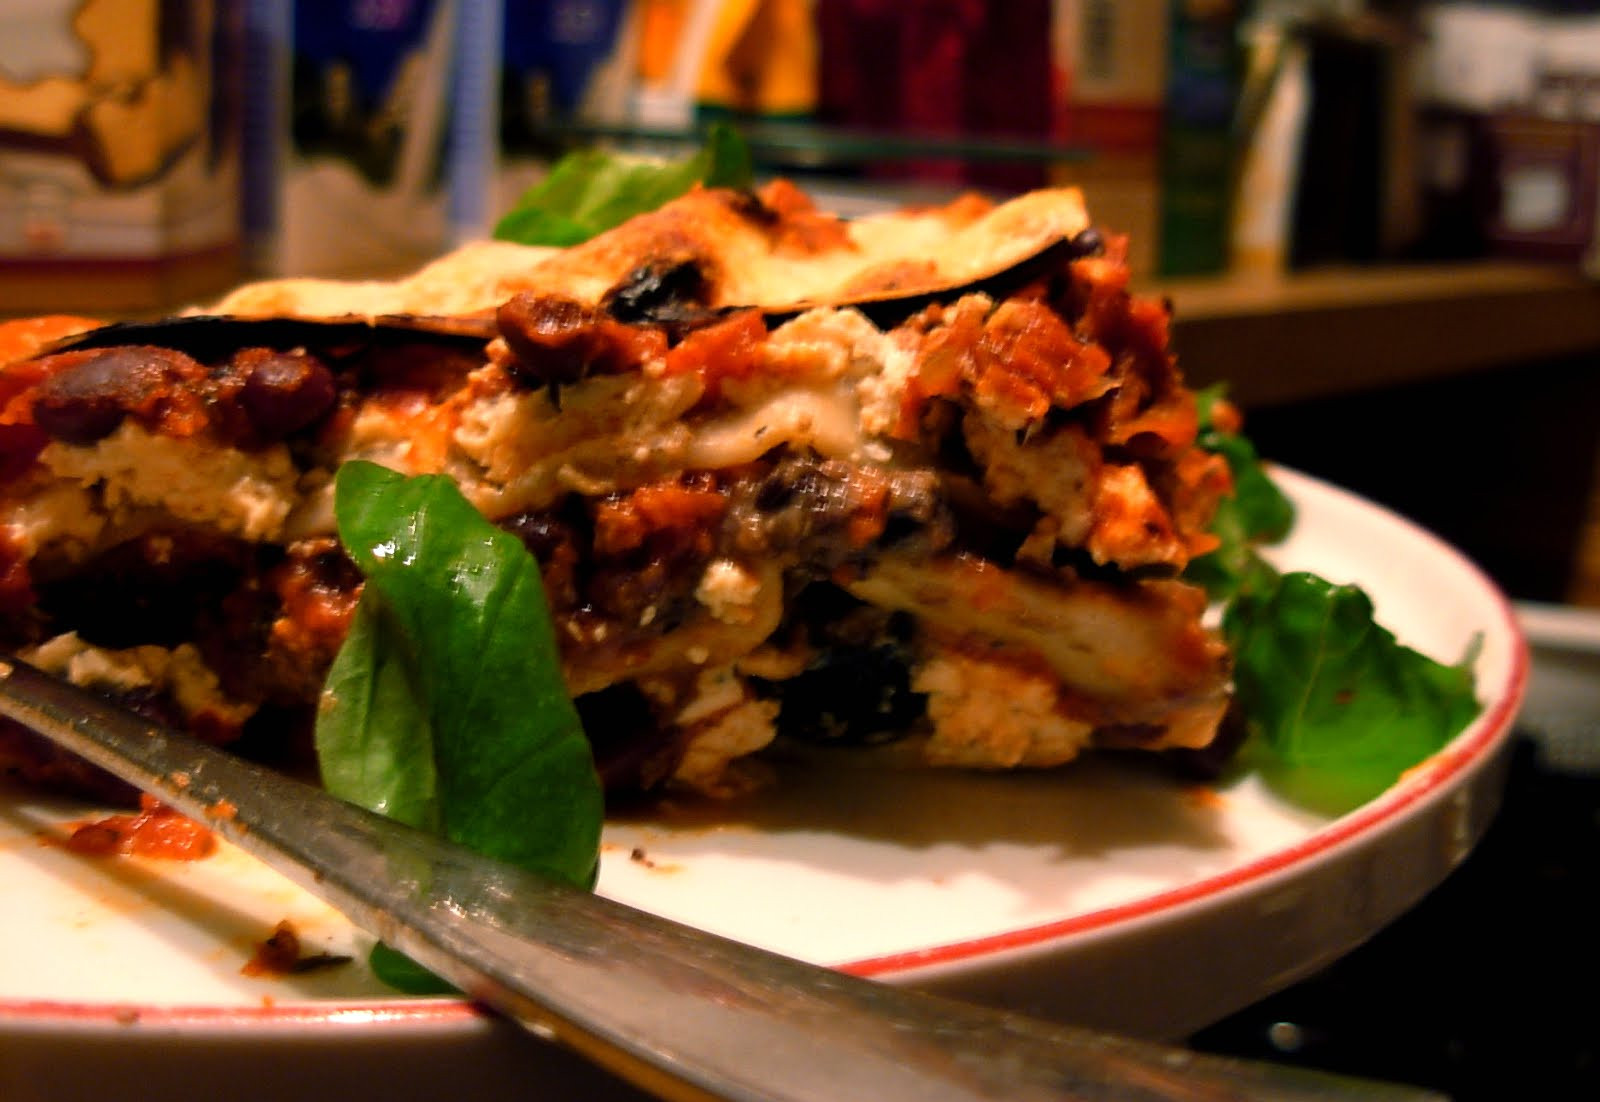 Vegetarian Lasagna Epicurious  true Ve arian Lasagna with Black Beans